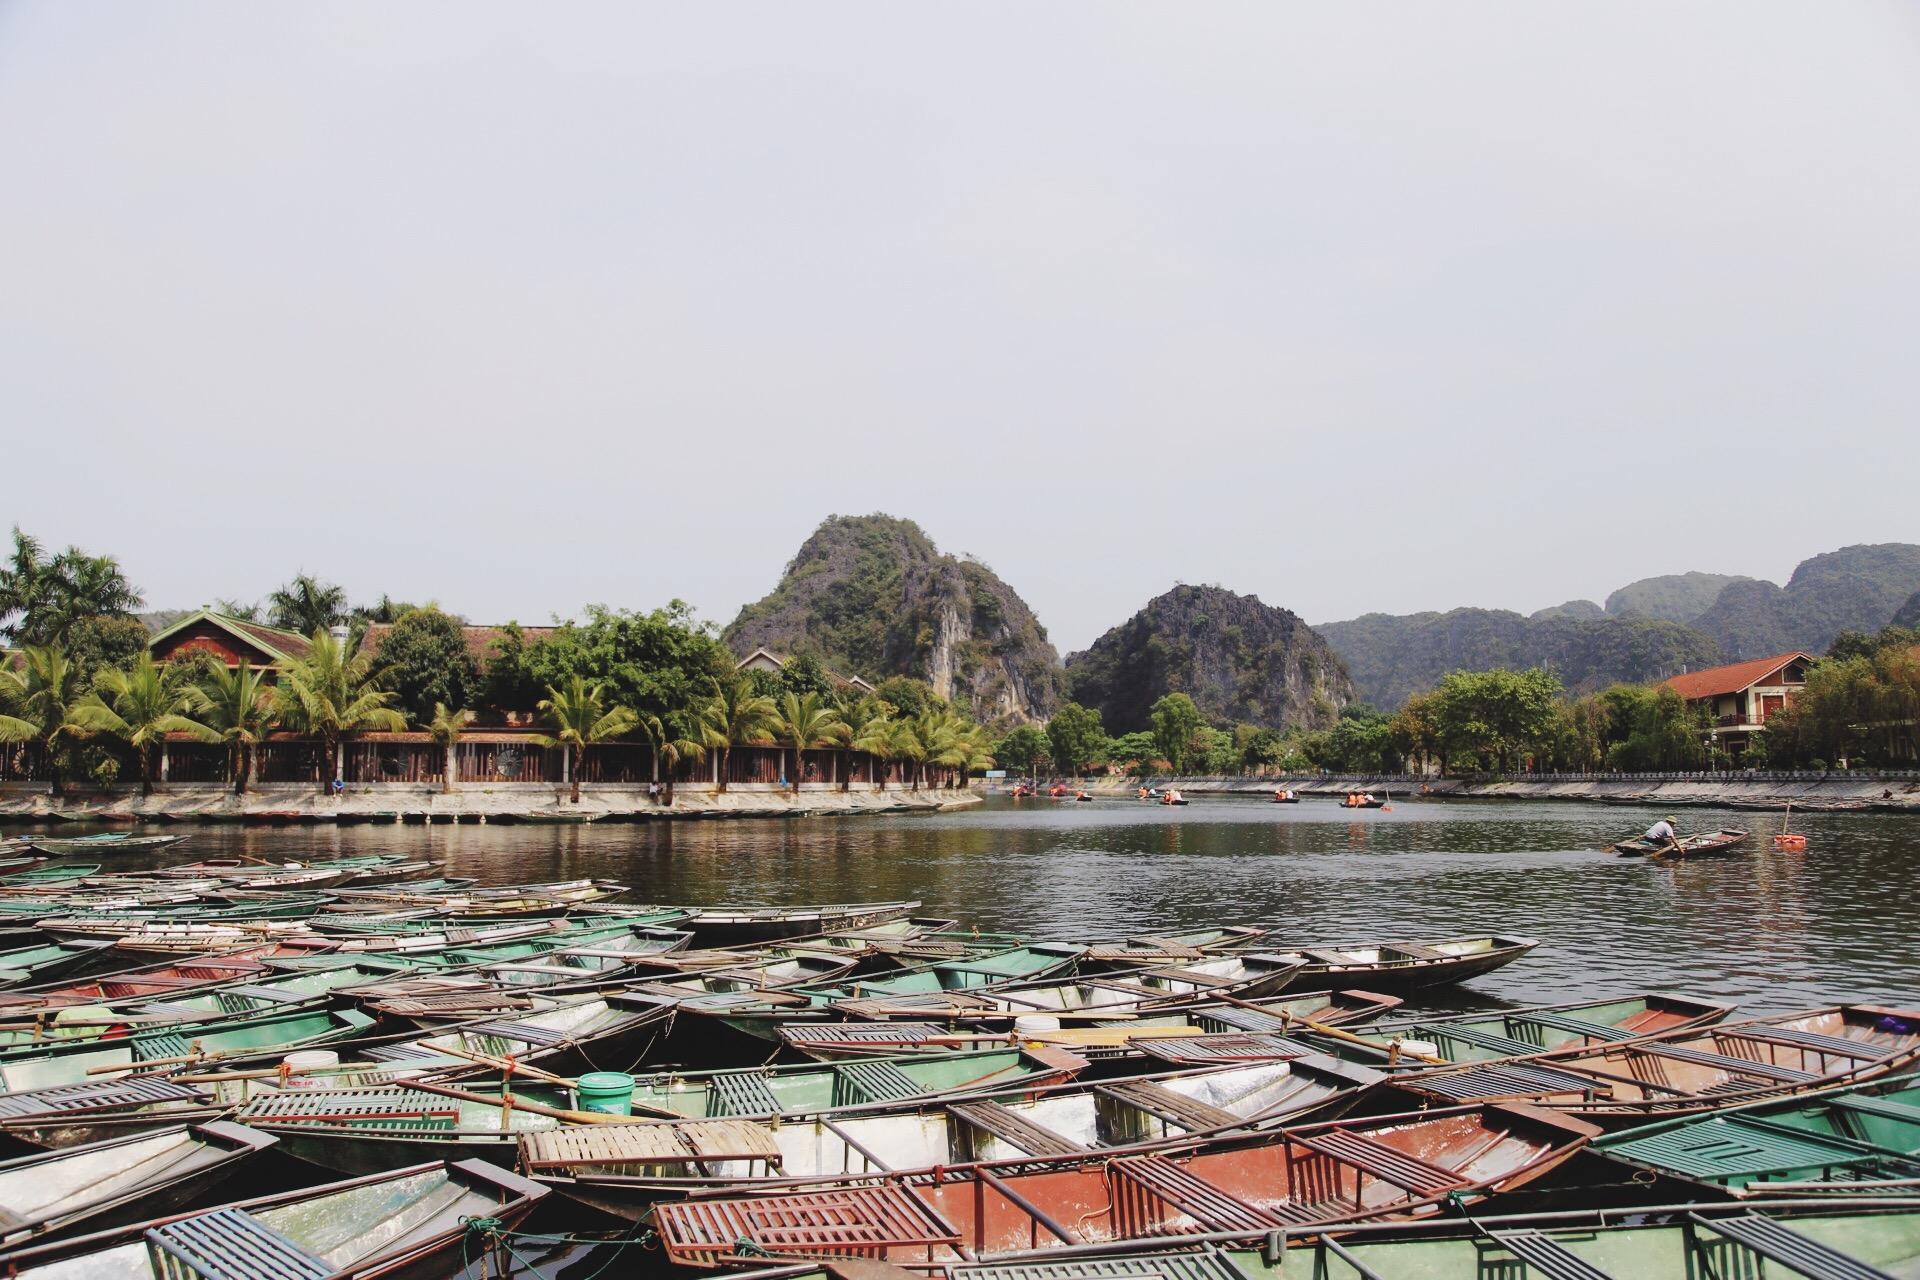 Tamcoc-baie-halong-terrestre-vietnam-voyage.JPG